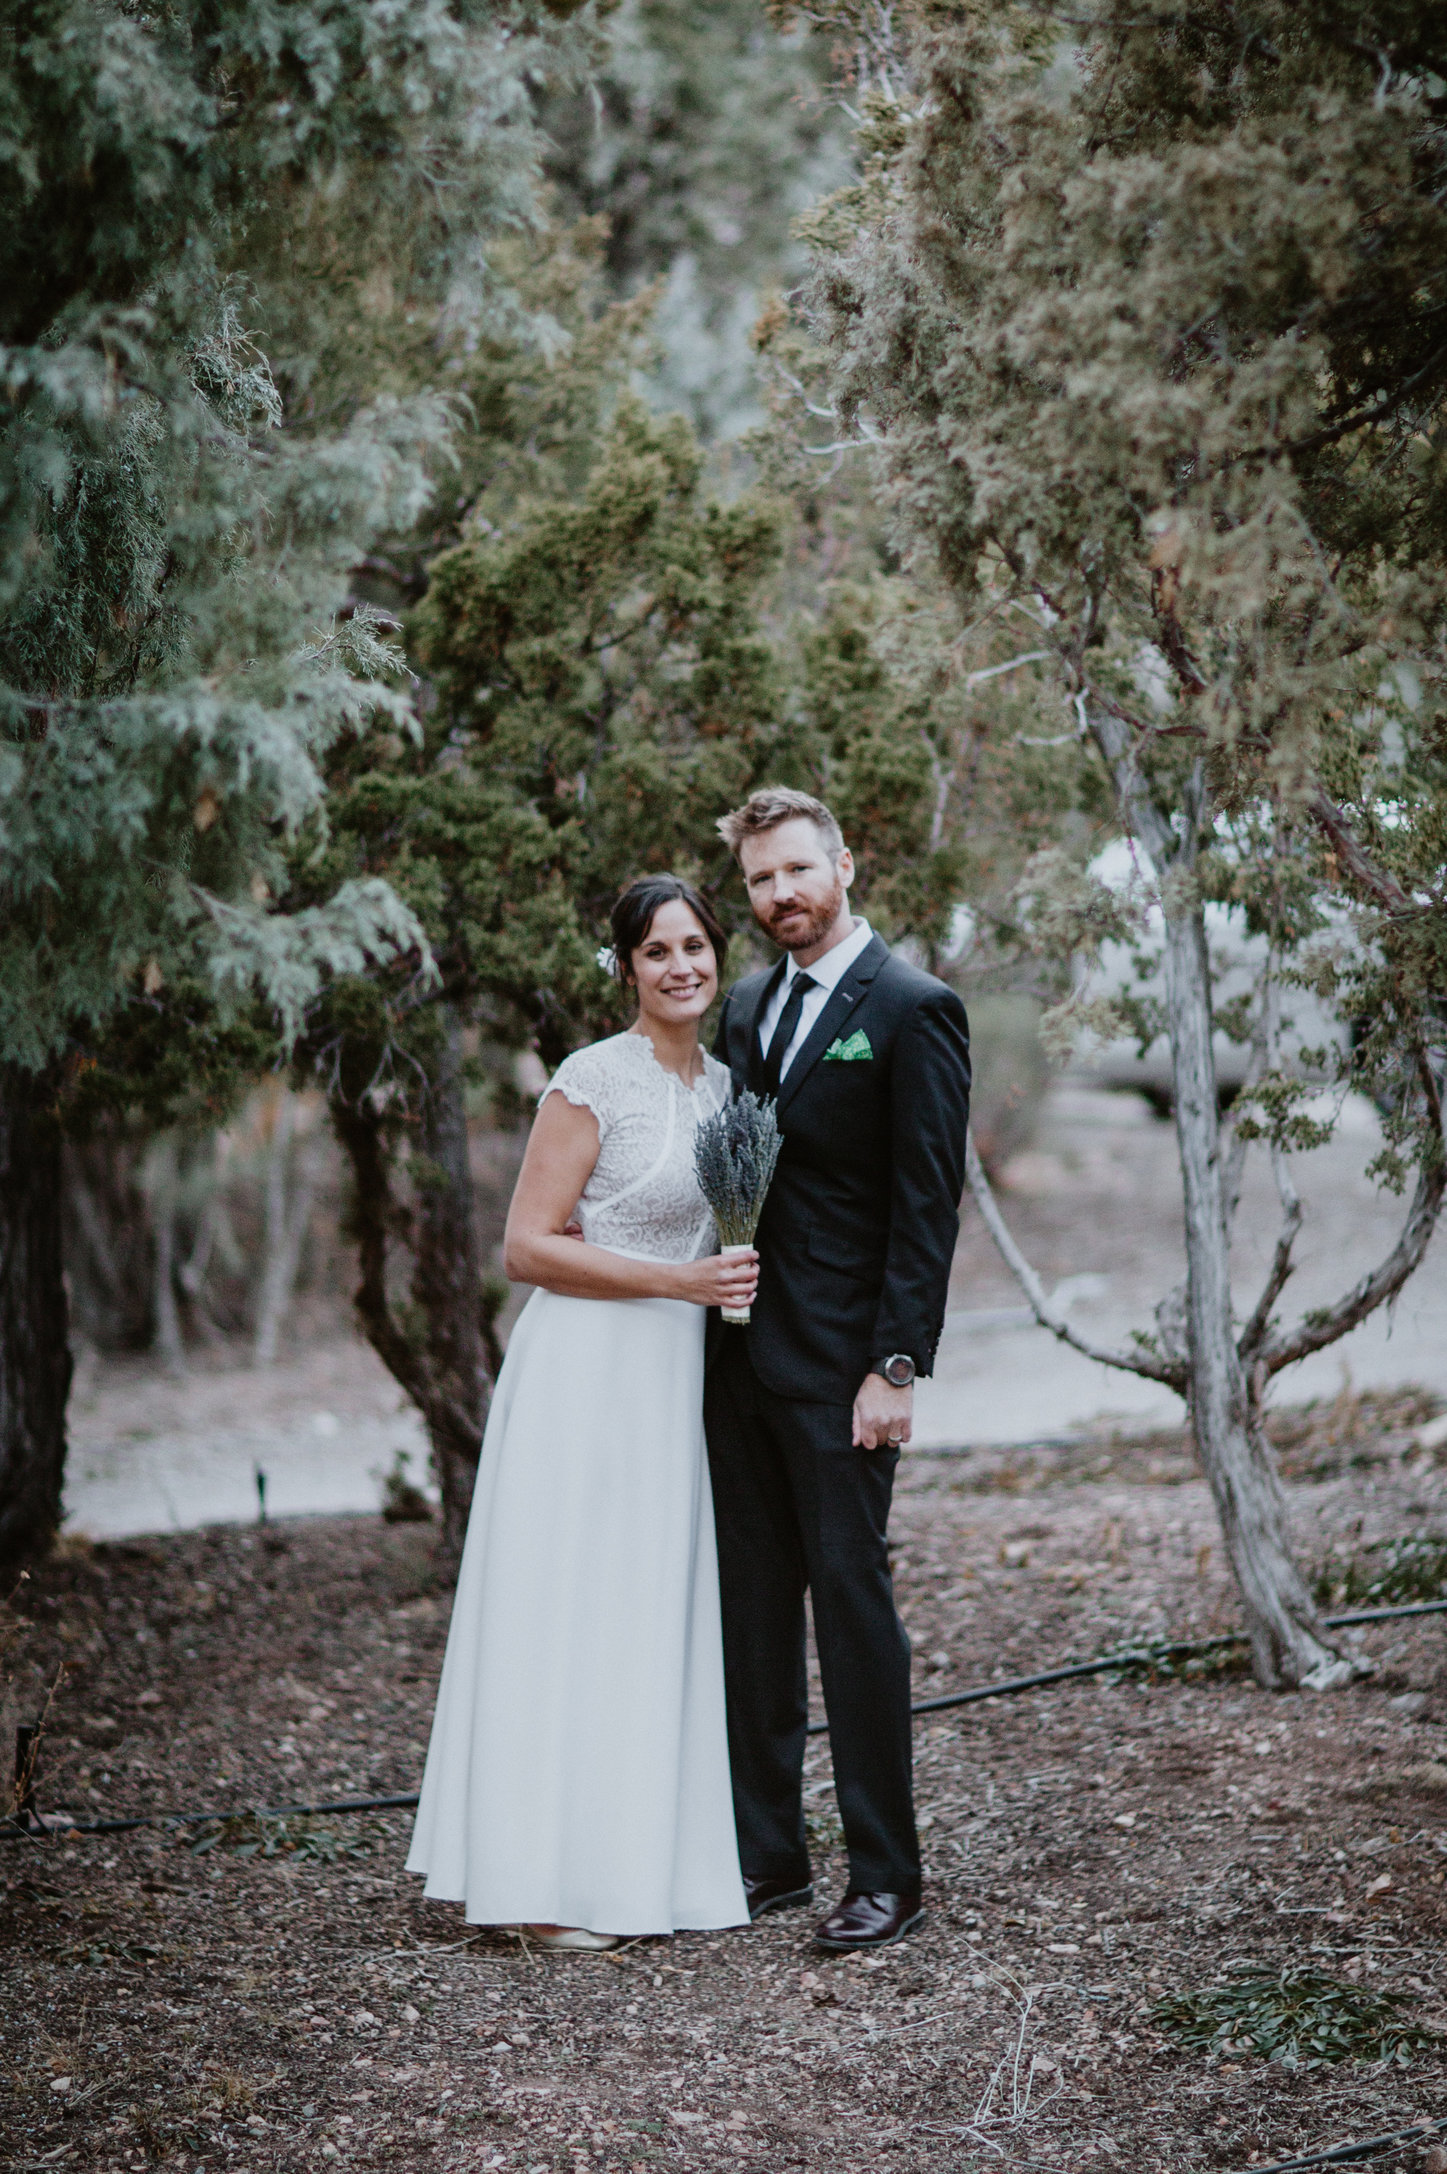 HandM-wedding-151.jpg